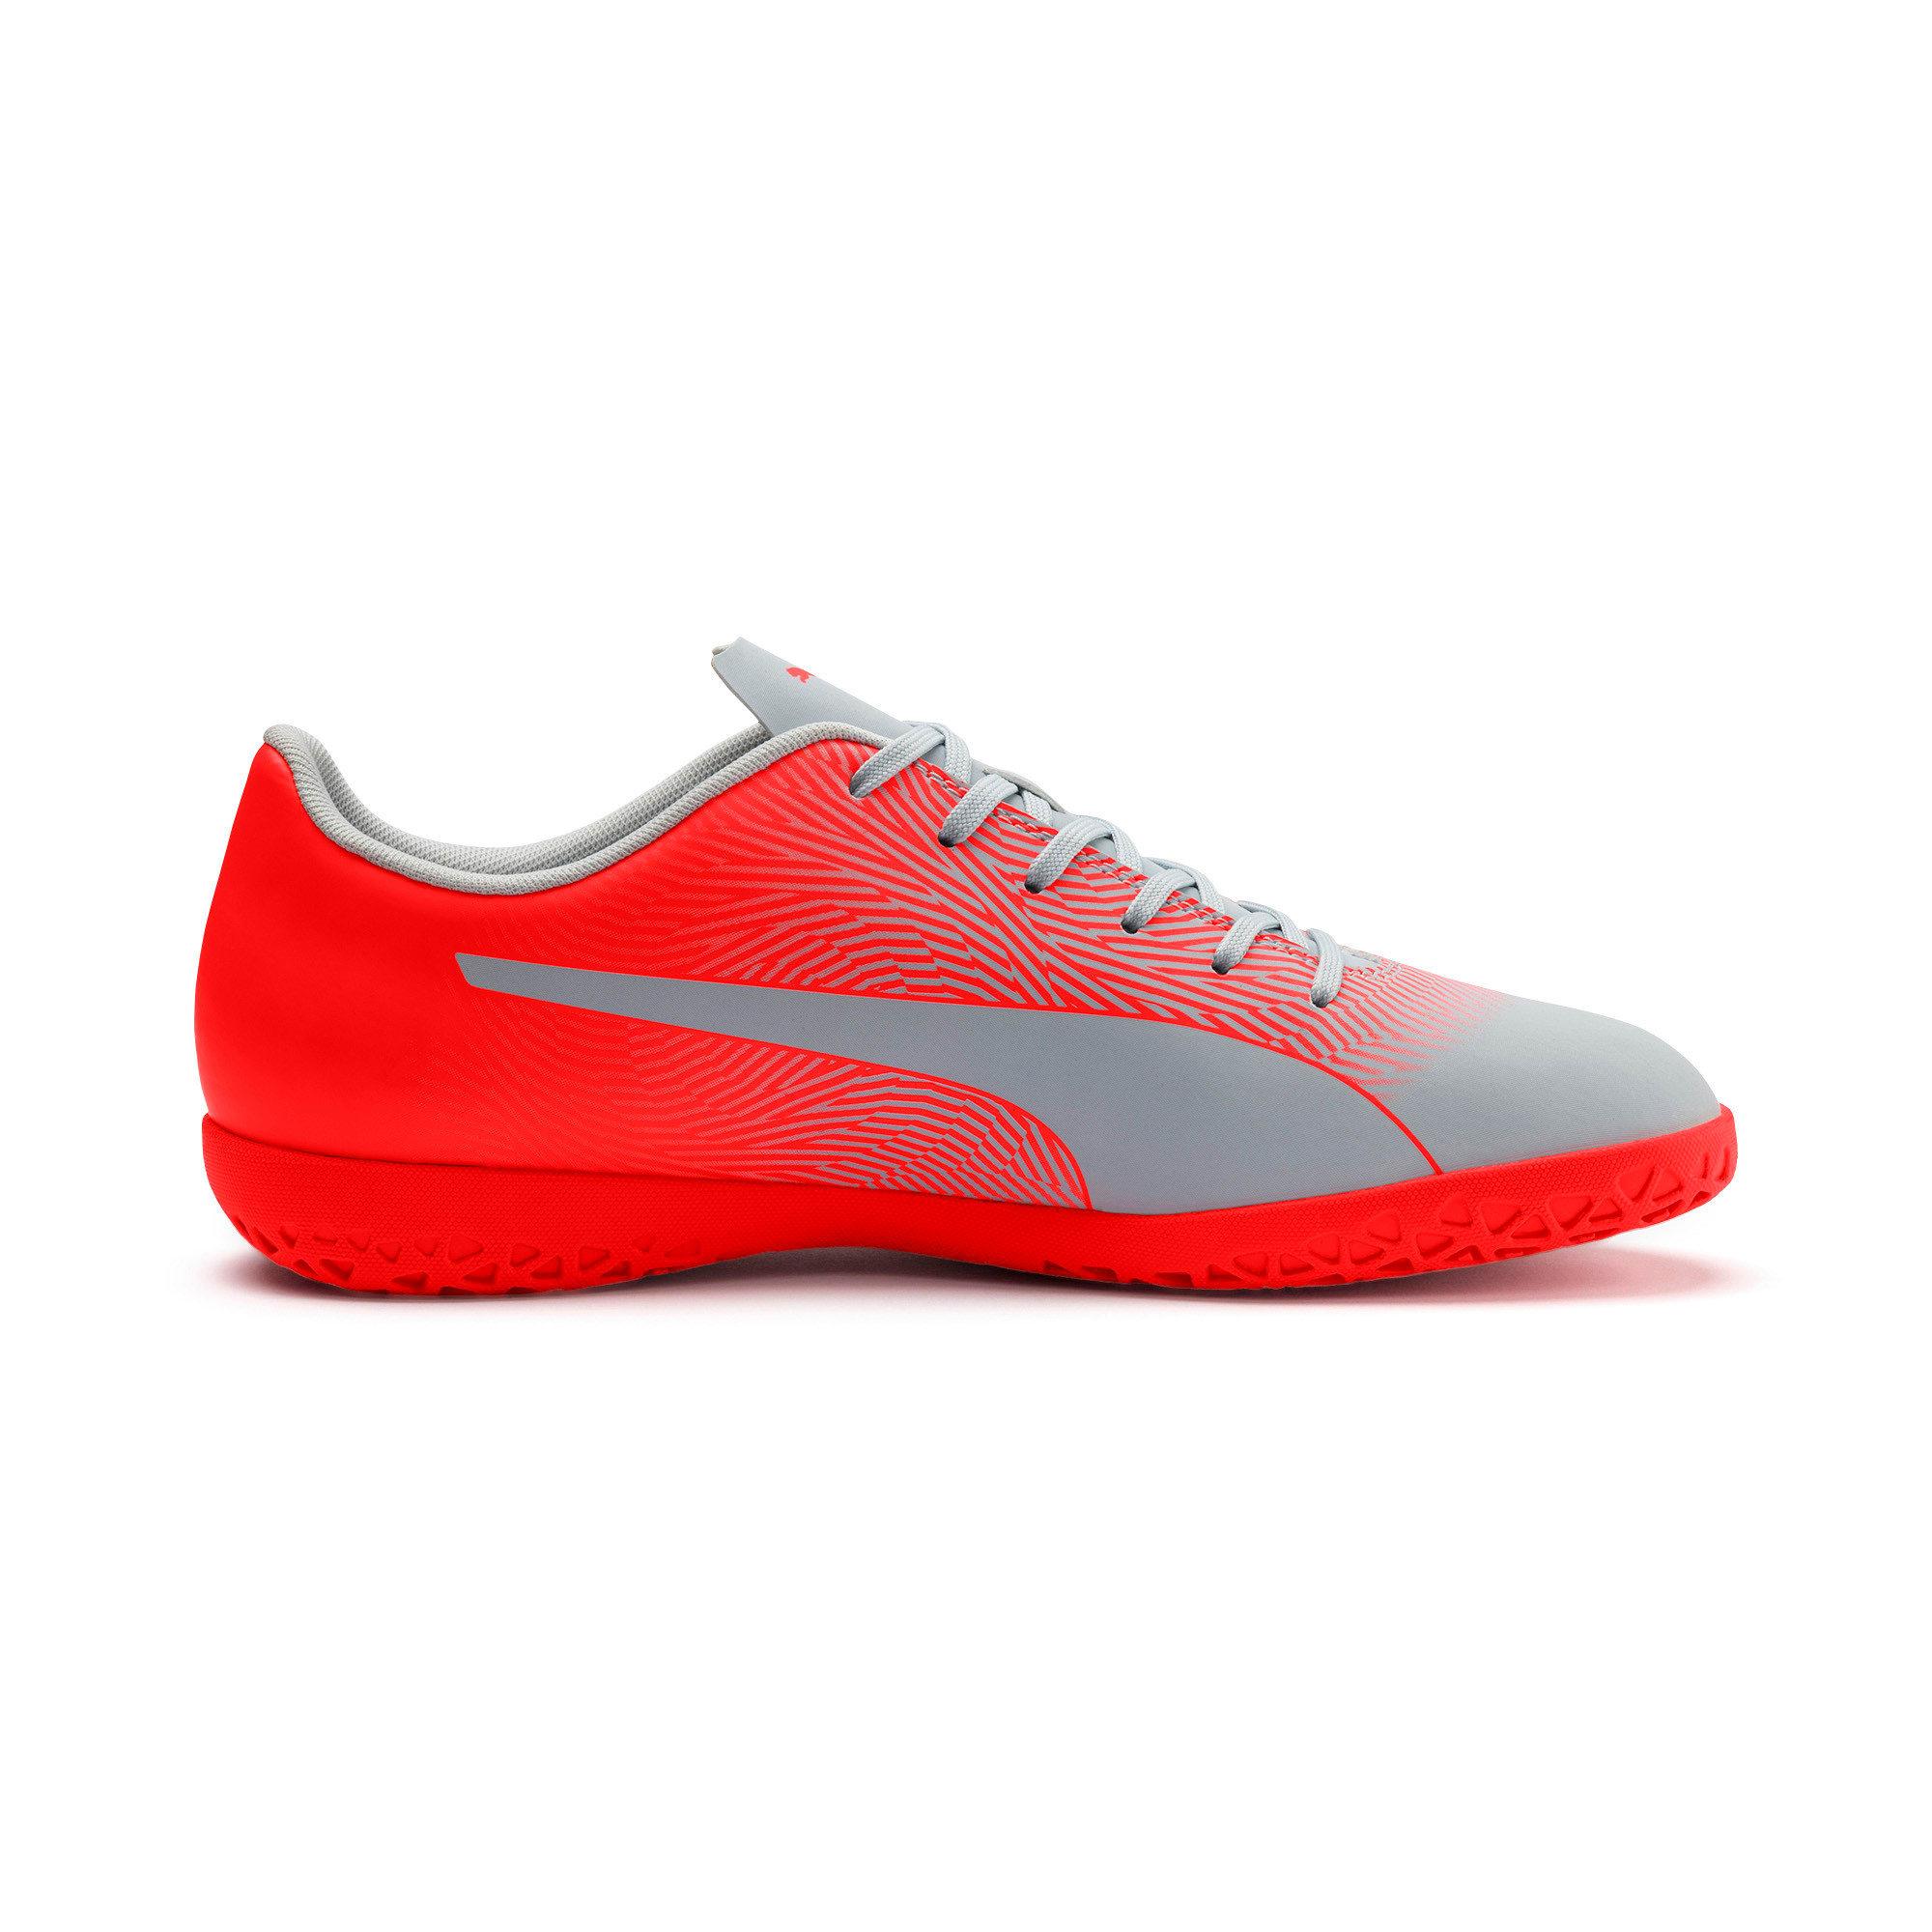 Thumbnail 6 of PUMA Spirit II IT Men's Soccer Shoes, Glacial Blue-Nrgy Red, medium